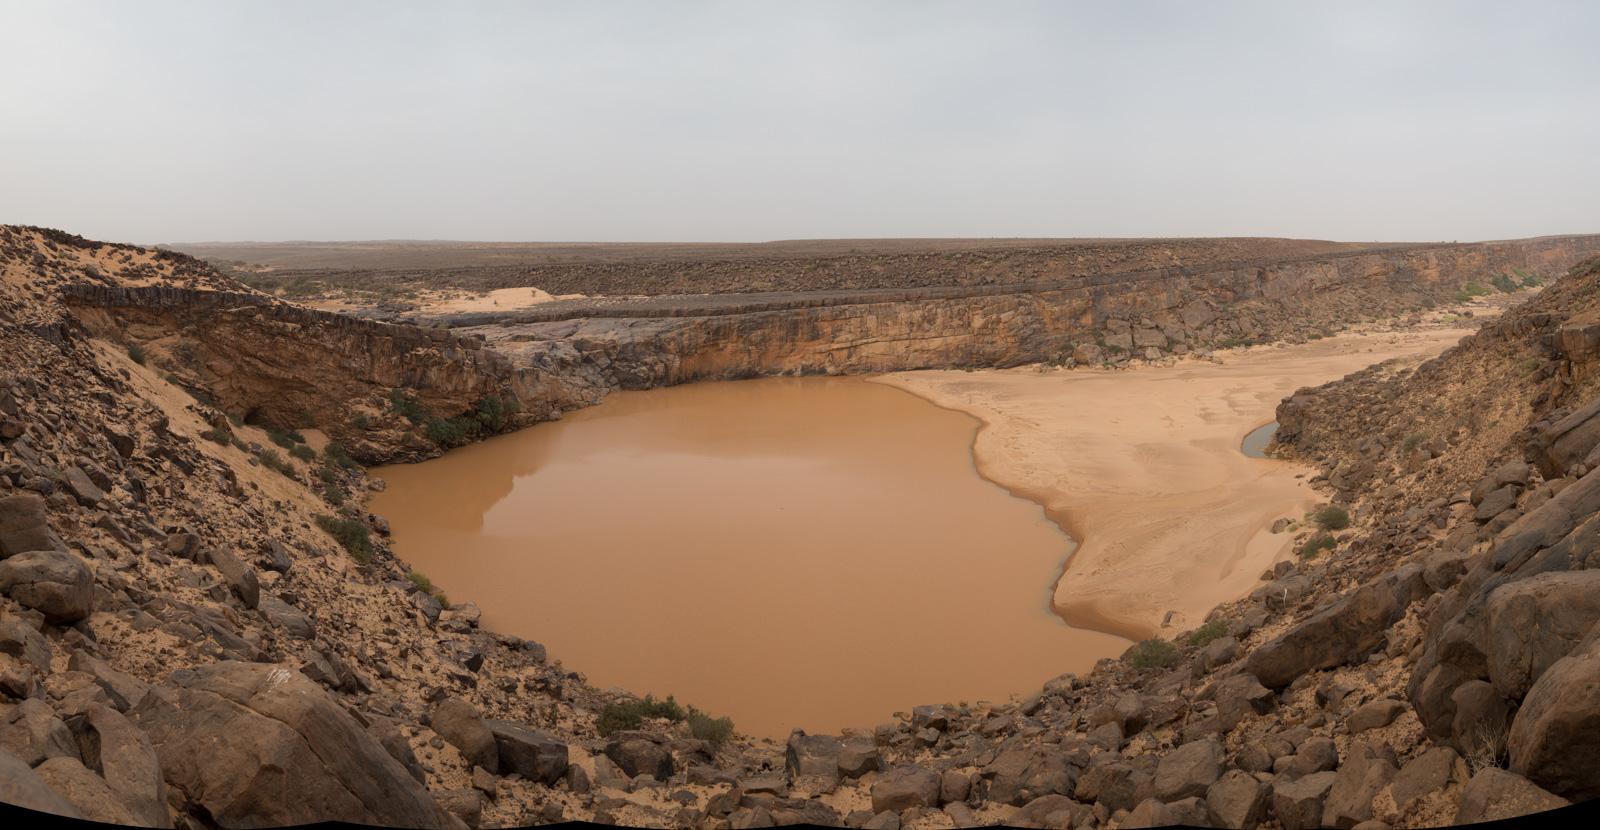 IMG_4023 Panorama